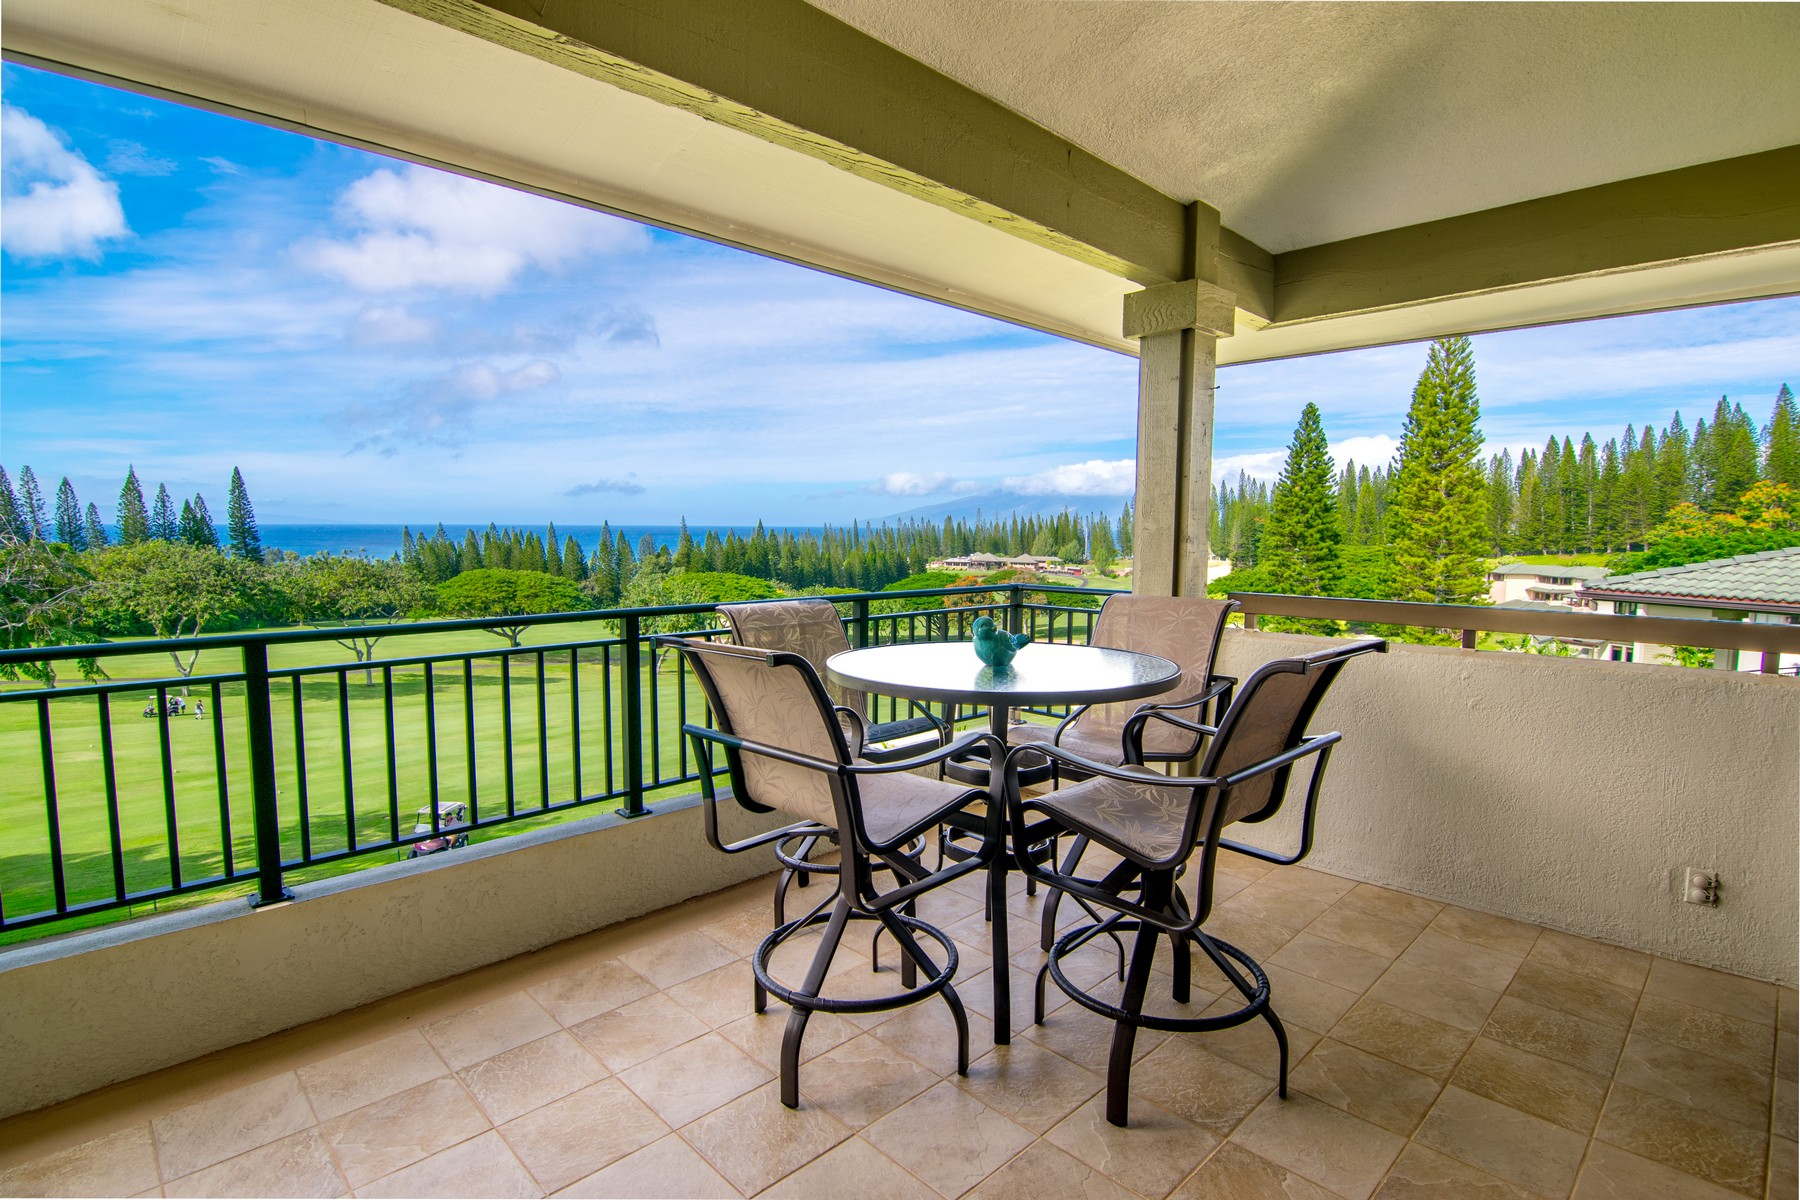 Condominio por un Venta en Par 5 Living On The Green In Kapalua 500 Kapalua Drive, Golf Villas 18V4 Kapalua, Hawaii, 96761 Estados Unidos